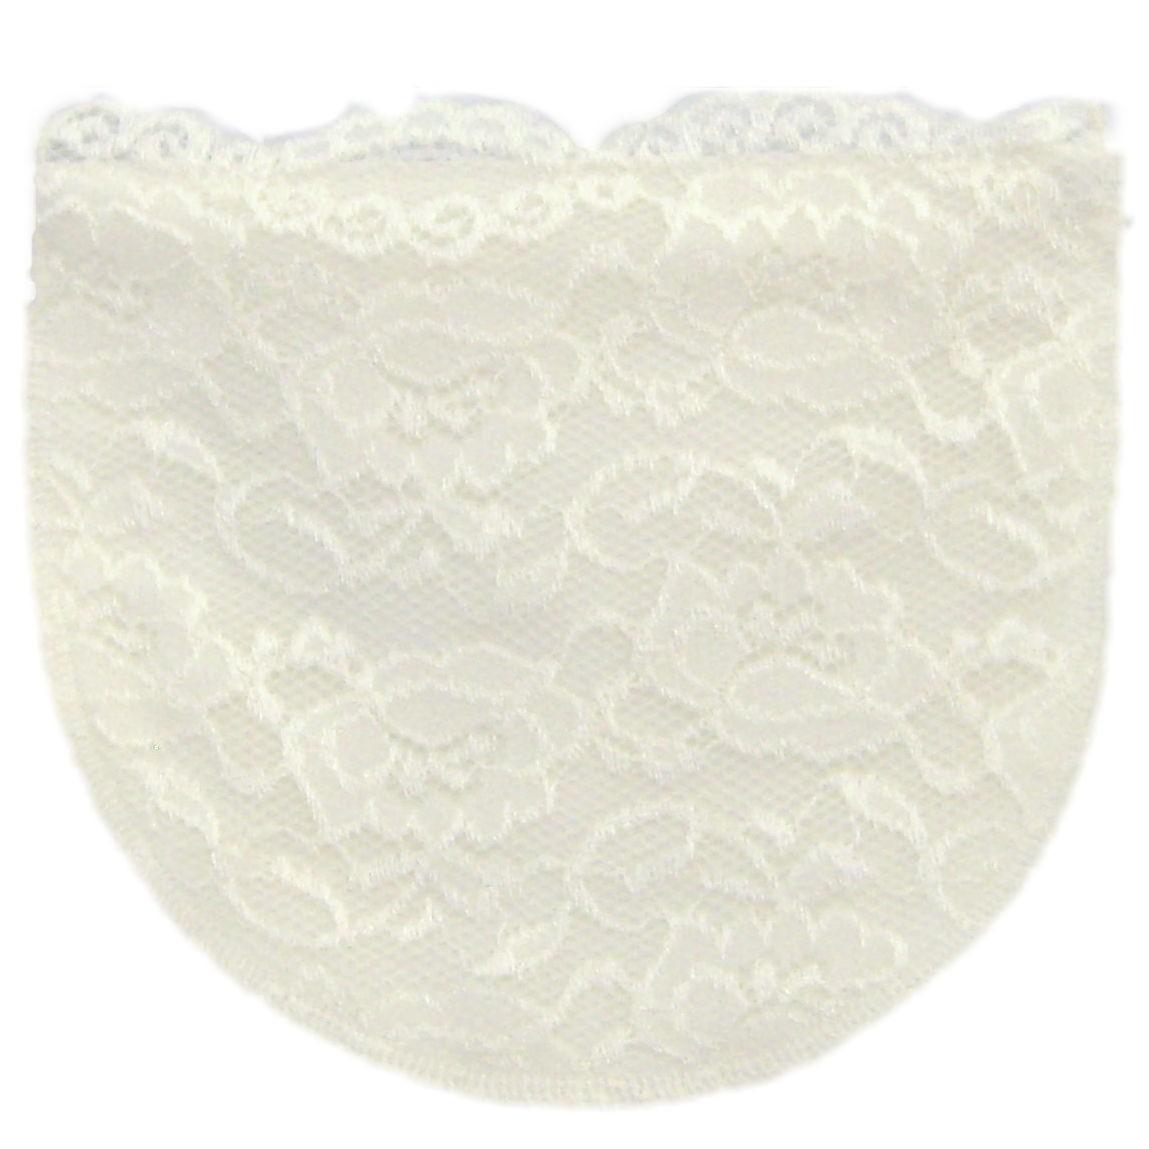 Ivory Full Lace Modesty Panel